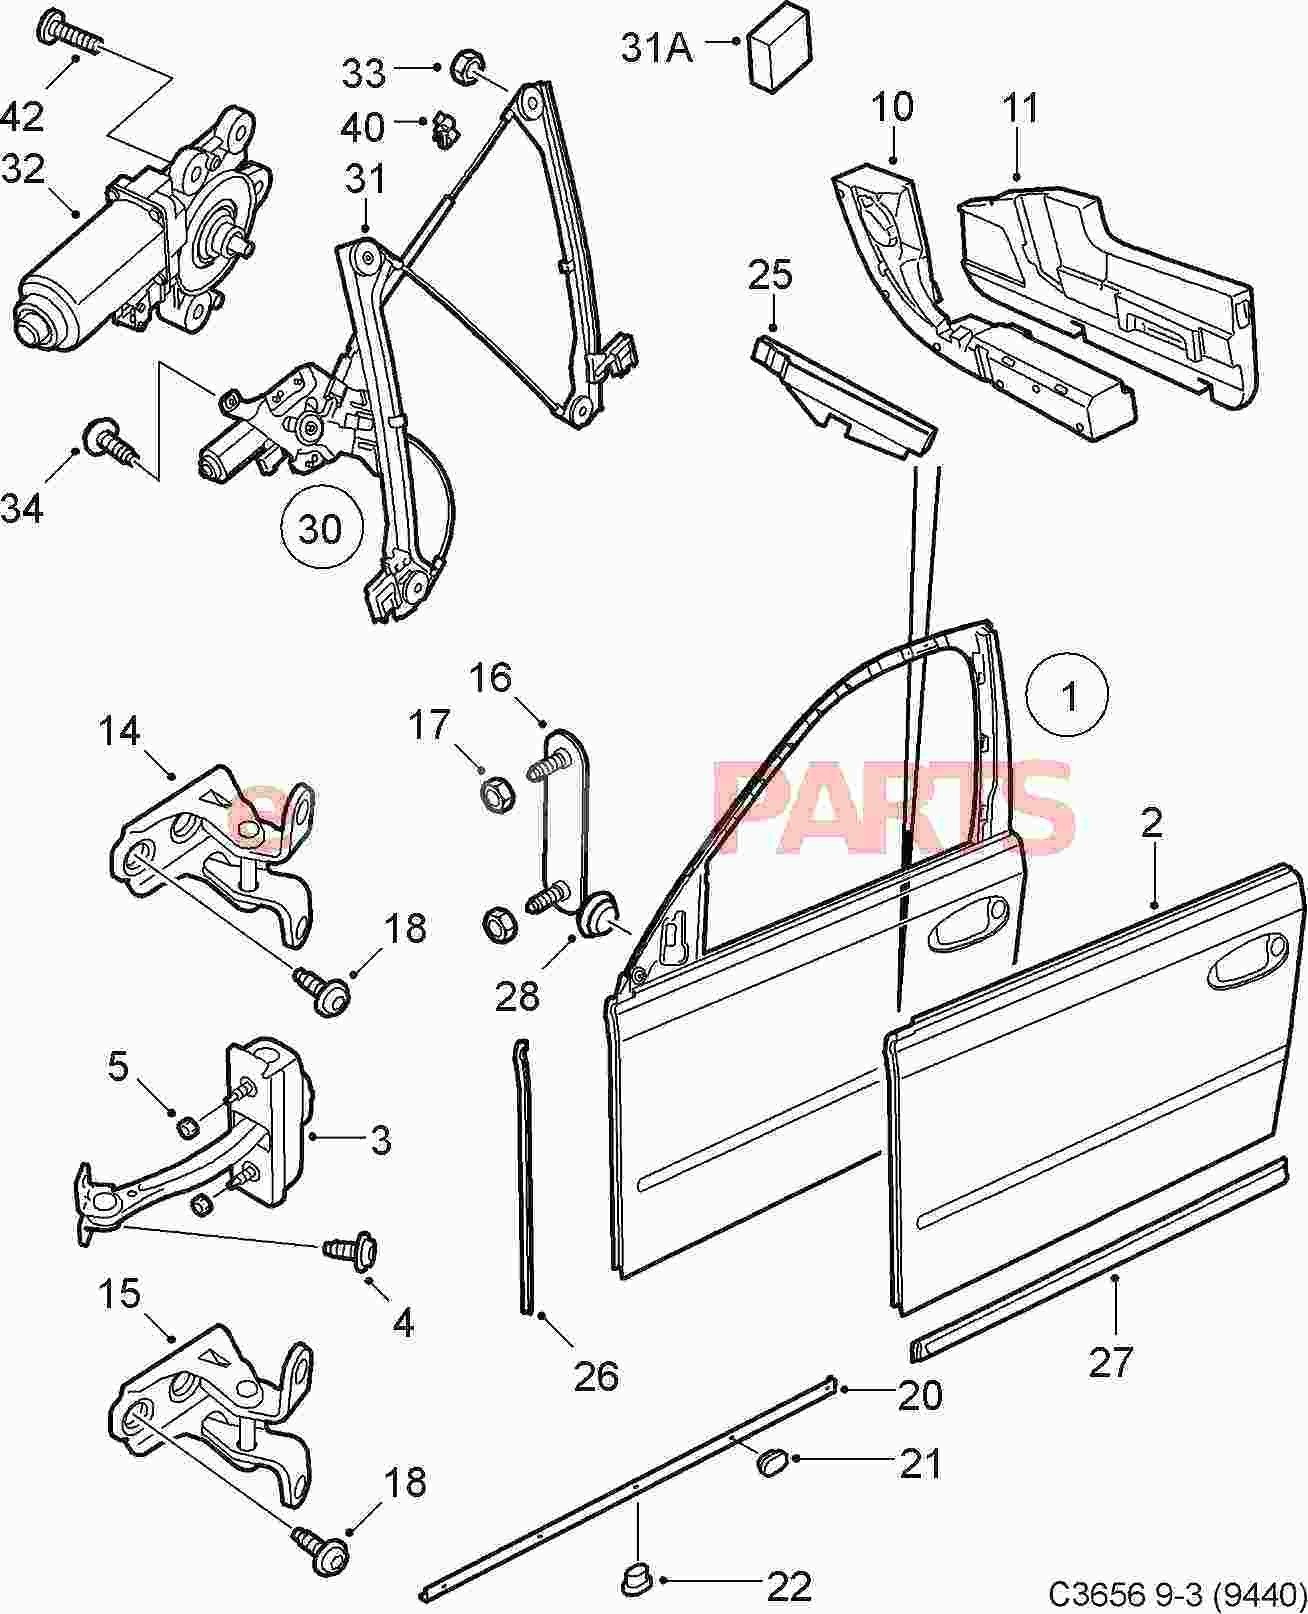 Diagram of car exterior parts car diagram 24 tremendous car undercarriage parts diagram car of diagram